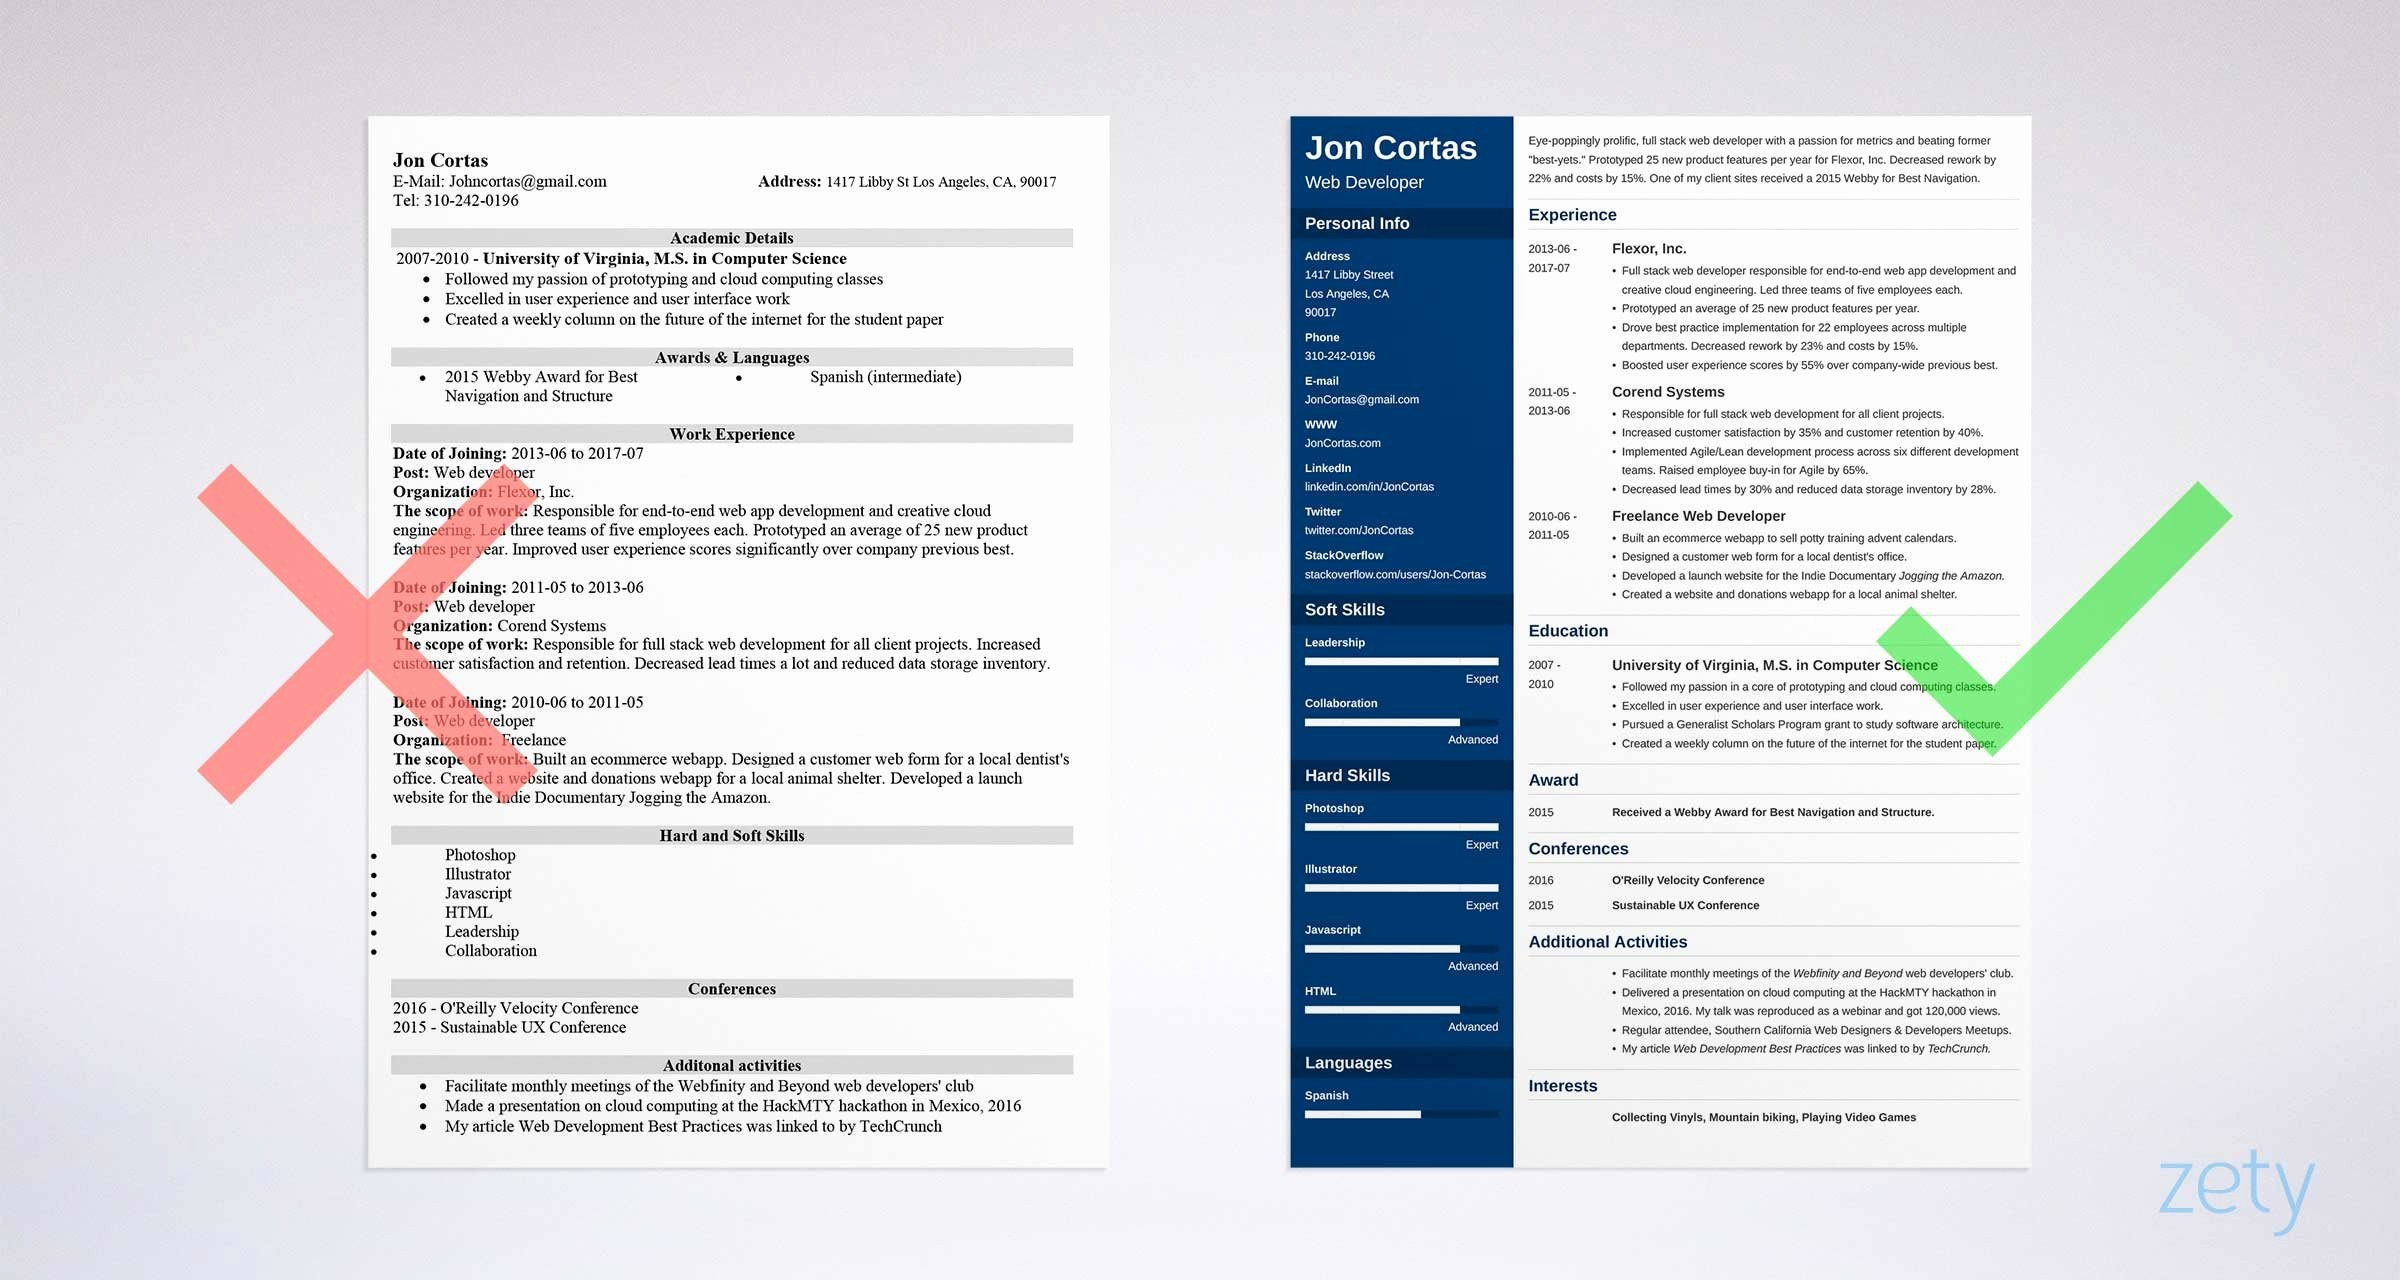 Resume Templates Microsoft Word Free Best Of Free Resume Templates for Word 15 Cv Resume formats to